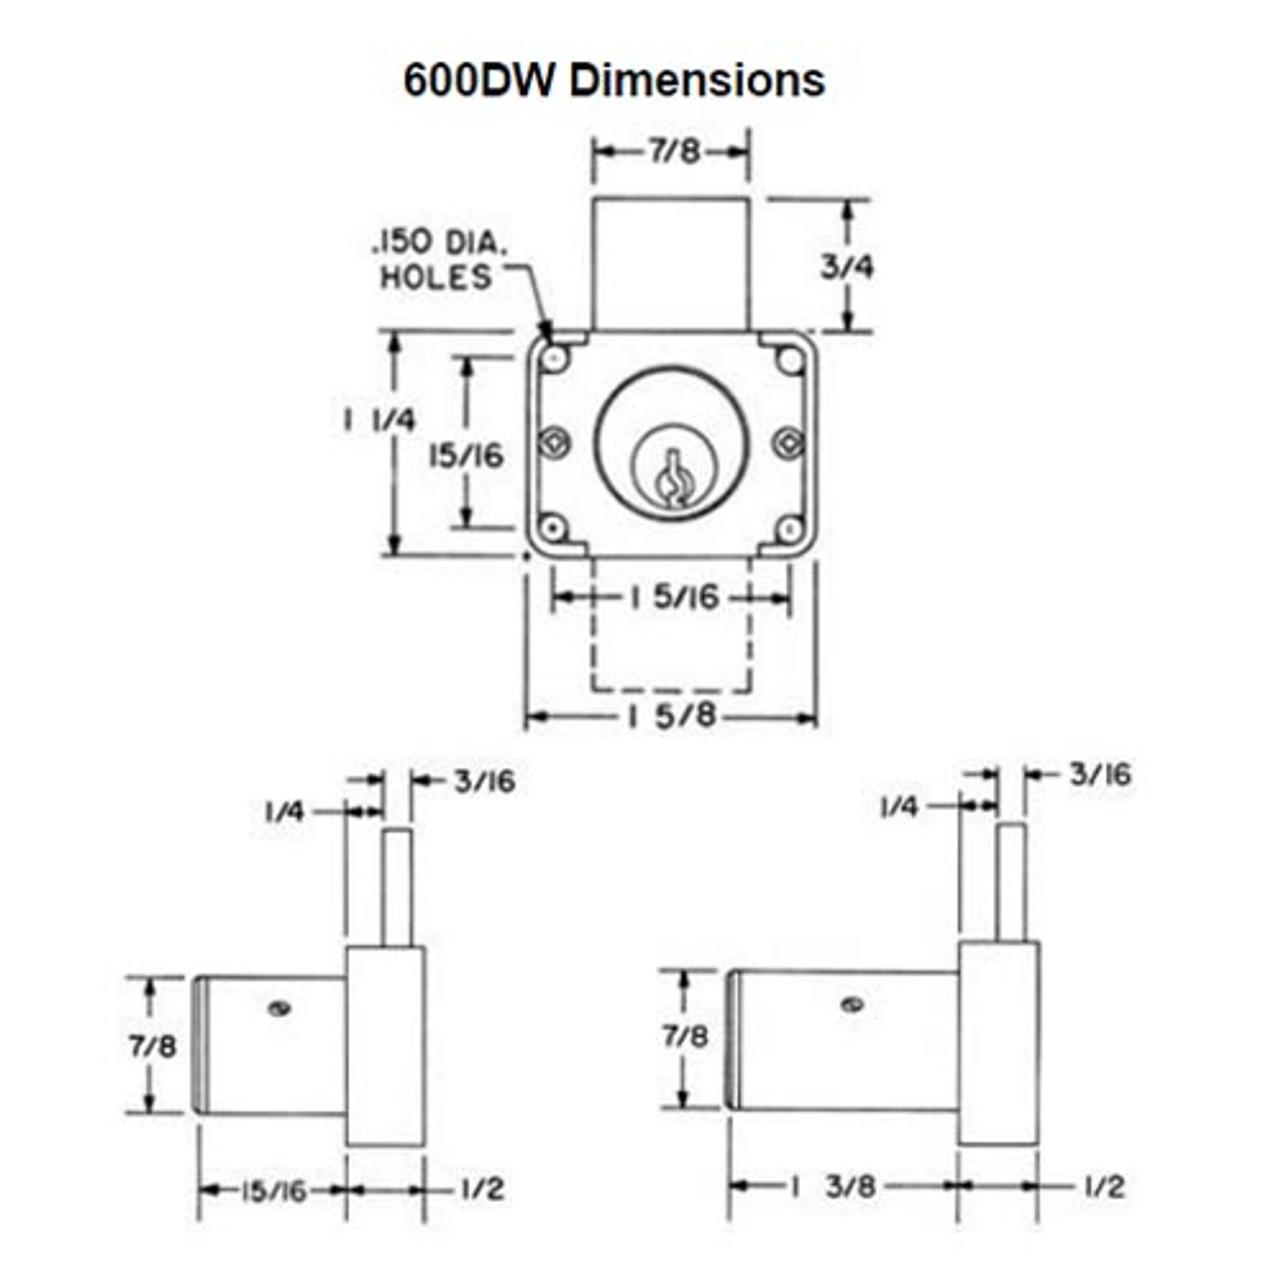 Olympus 600DW-KD-US4-1-3/8 R Series Drawer Deadbolt Cabinet Locks in Satin Brass